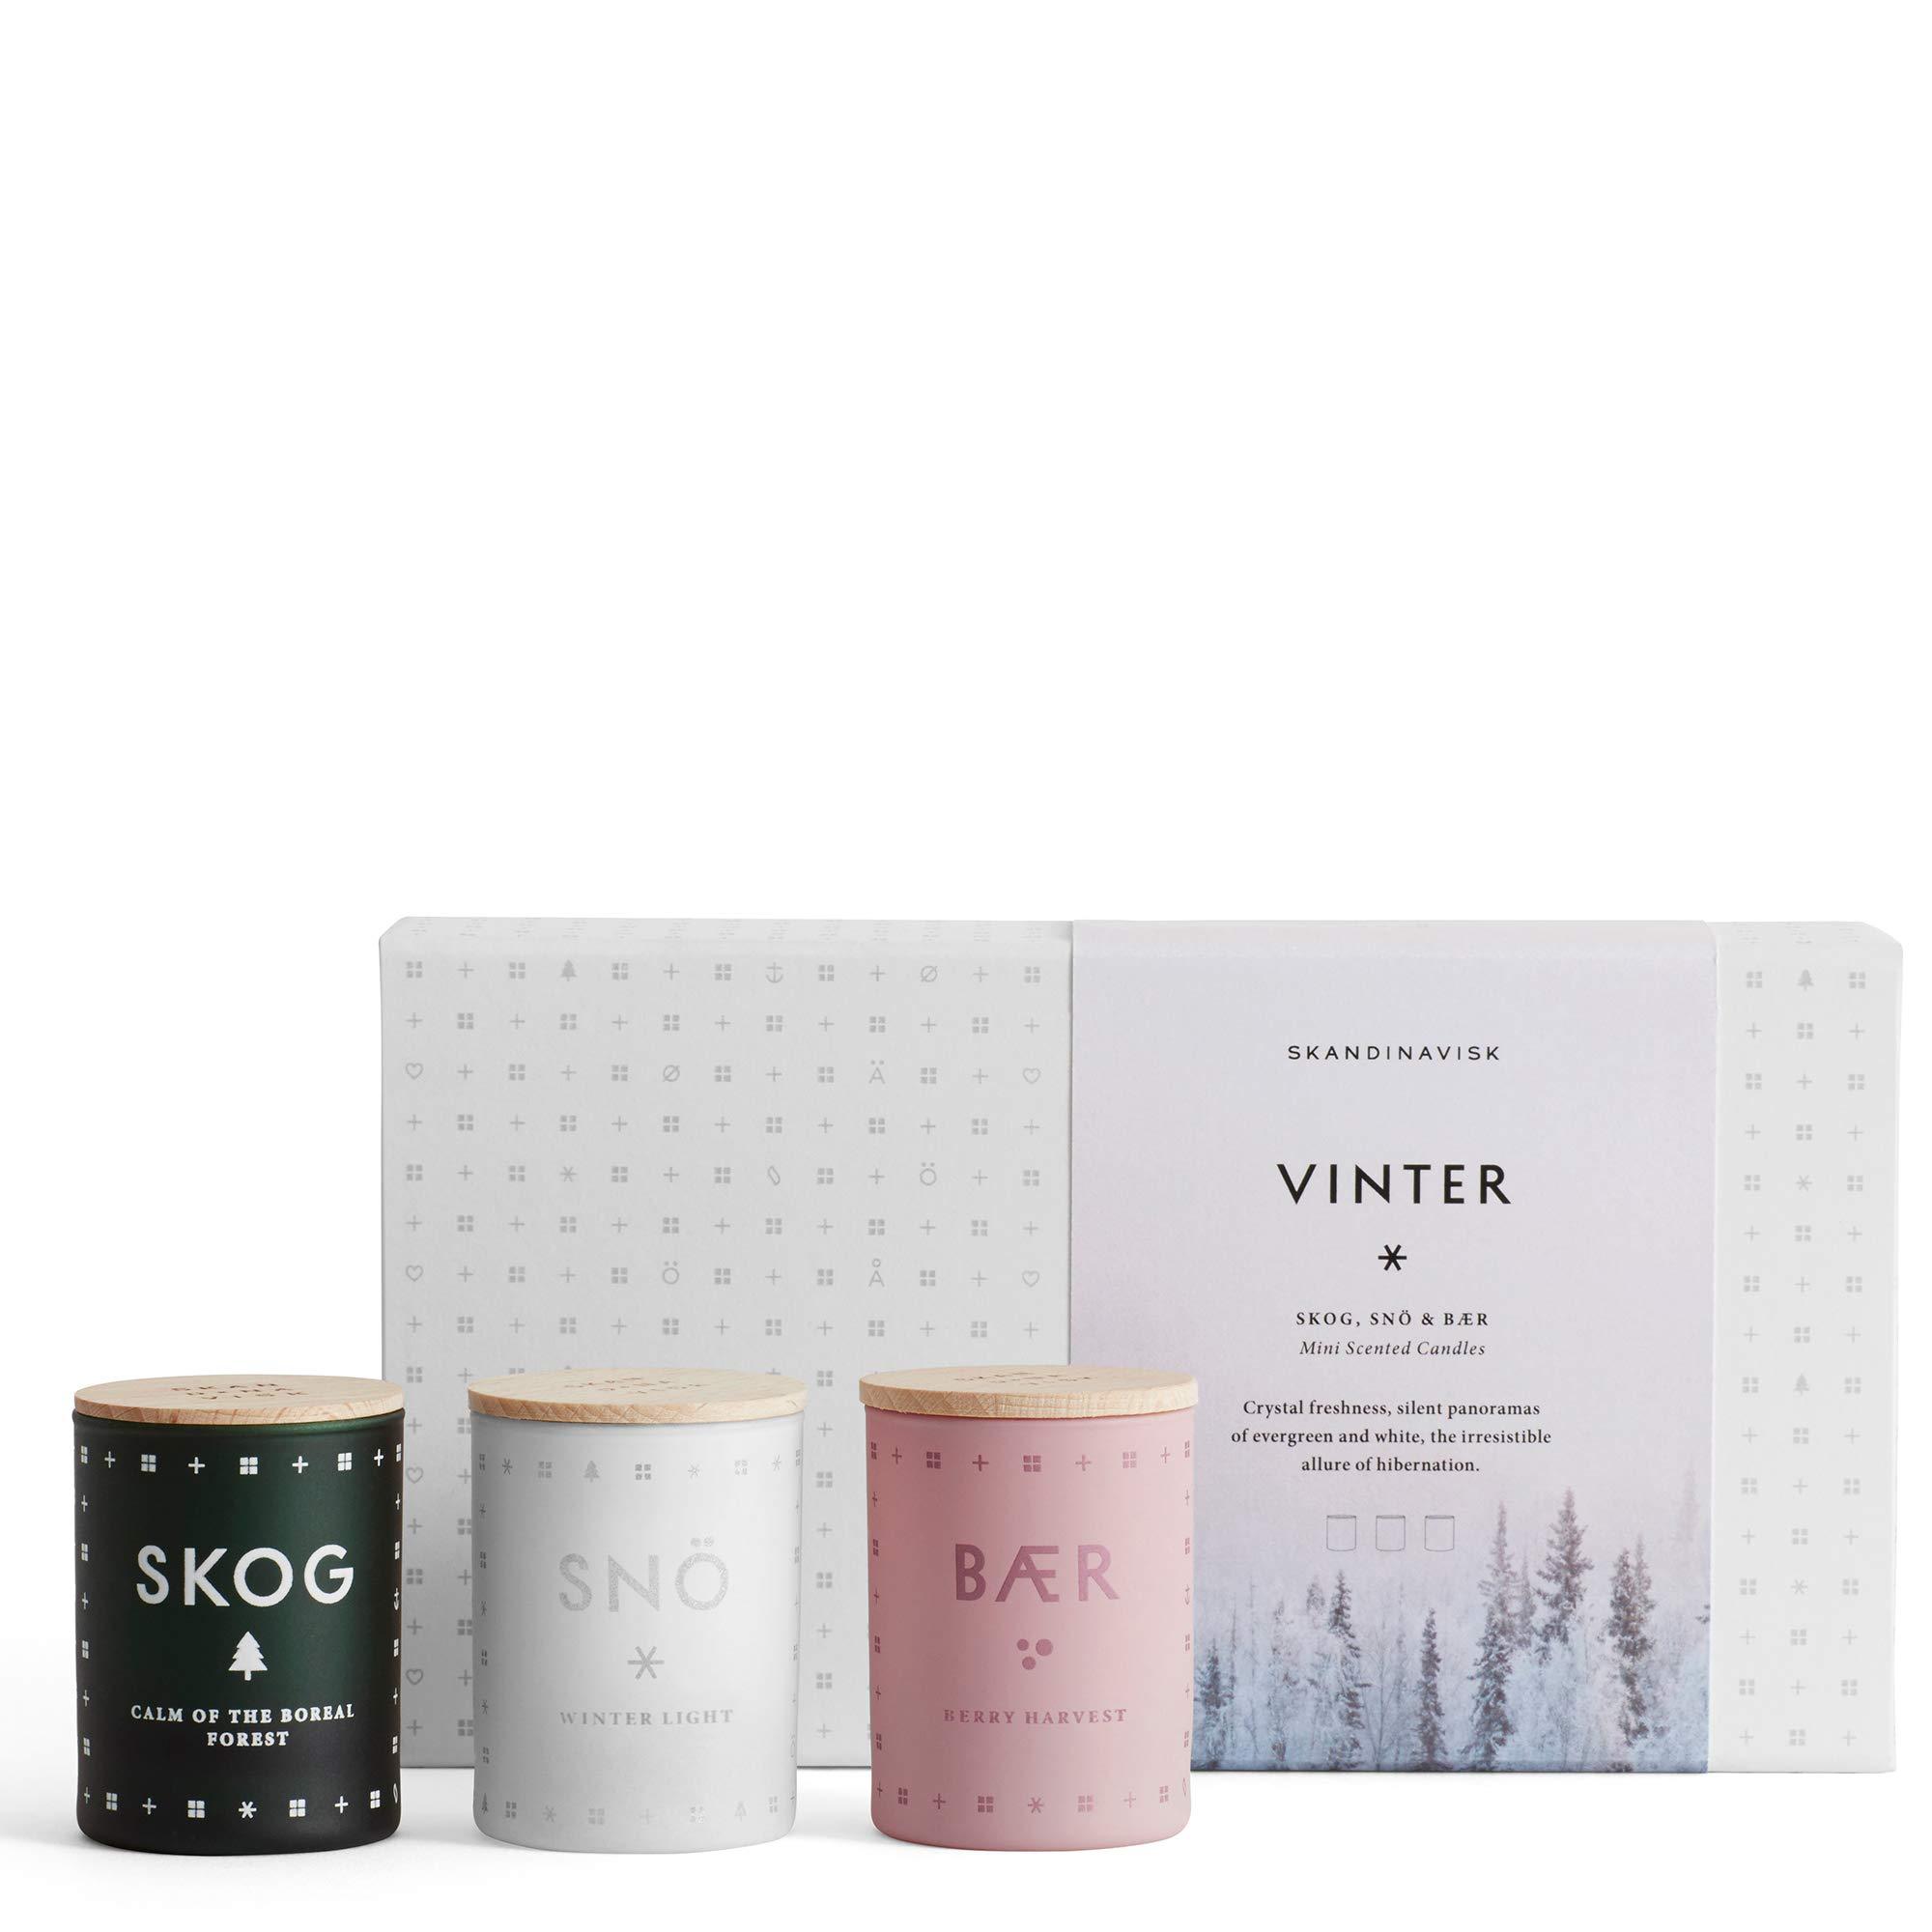 SKANDINAVISK Vinter (Winter) Mini Candle Gift Set 3 x 1.94 Oz